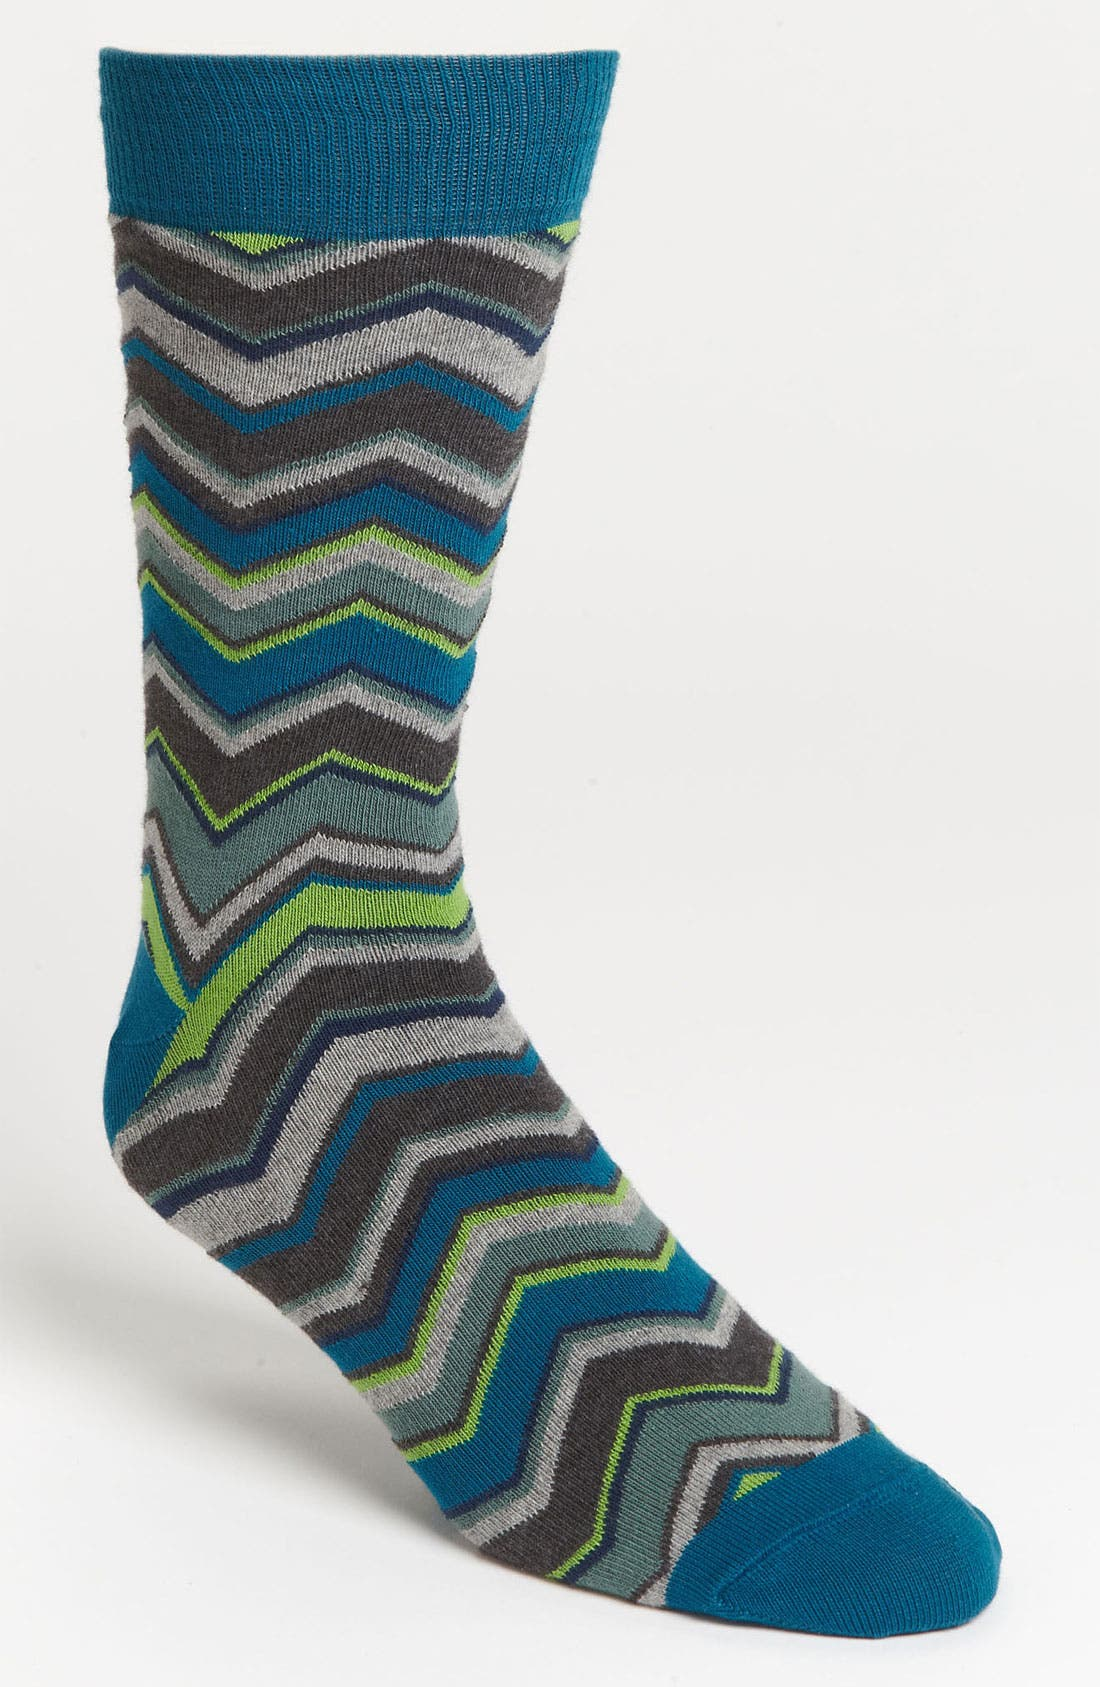 Alternate Image 1 Selected - Pact Zigzag Socks